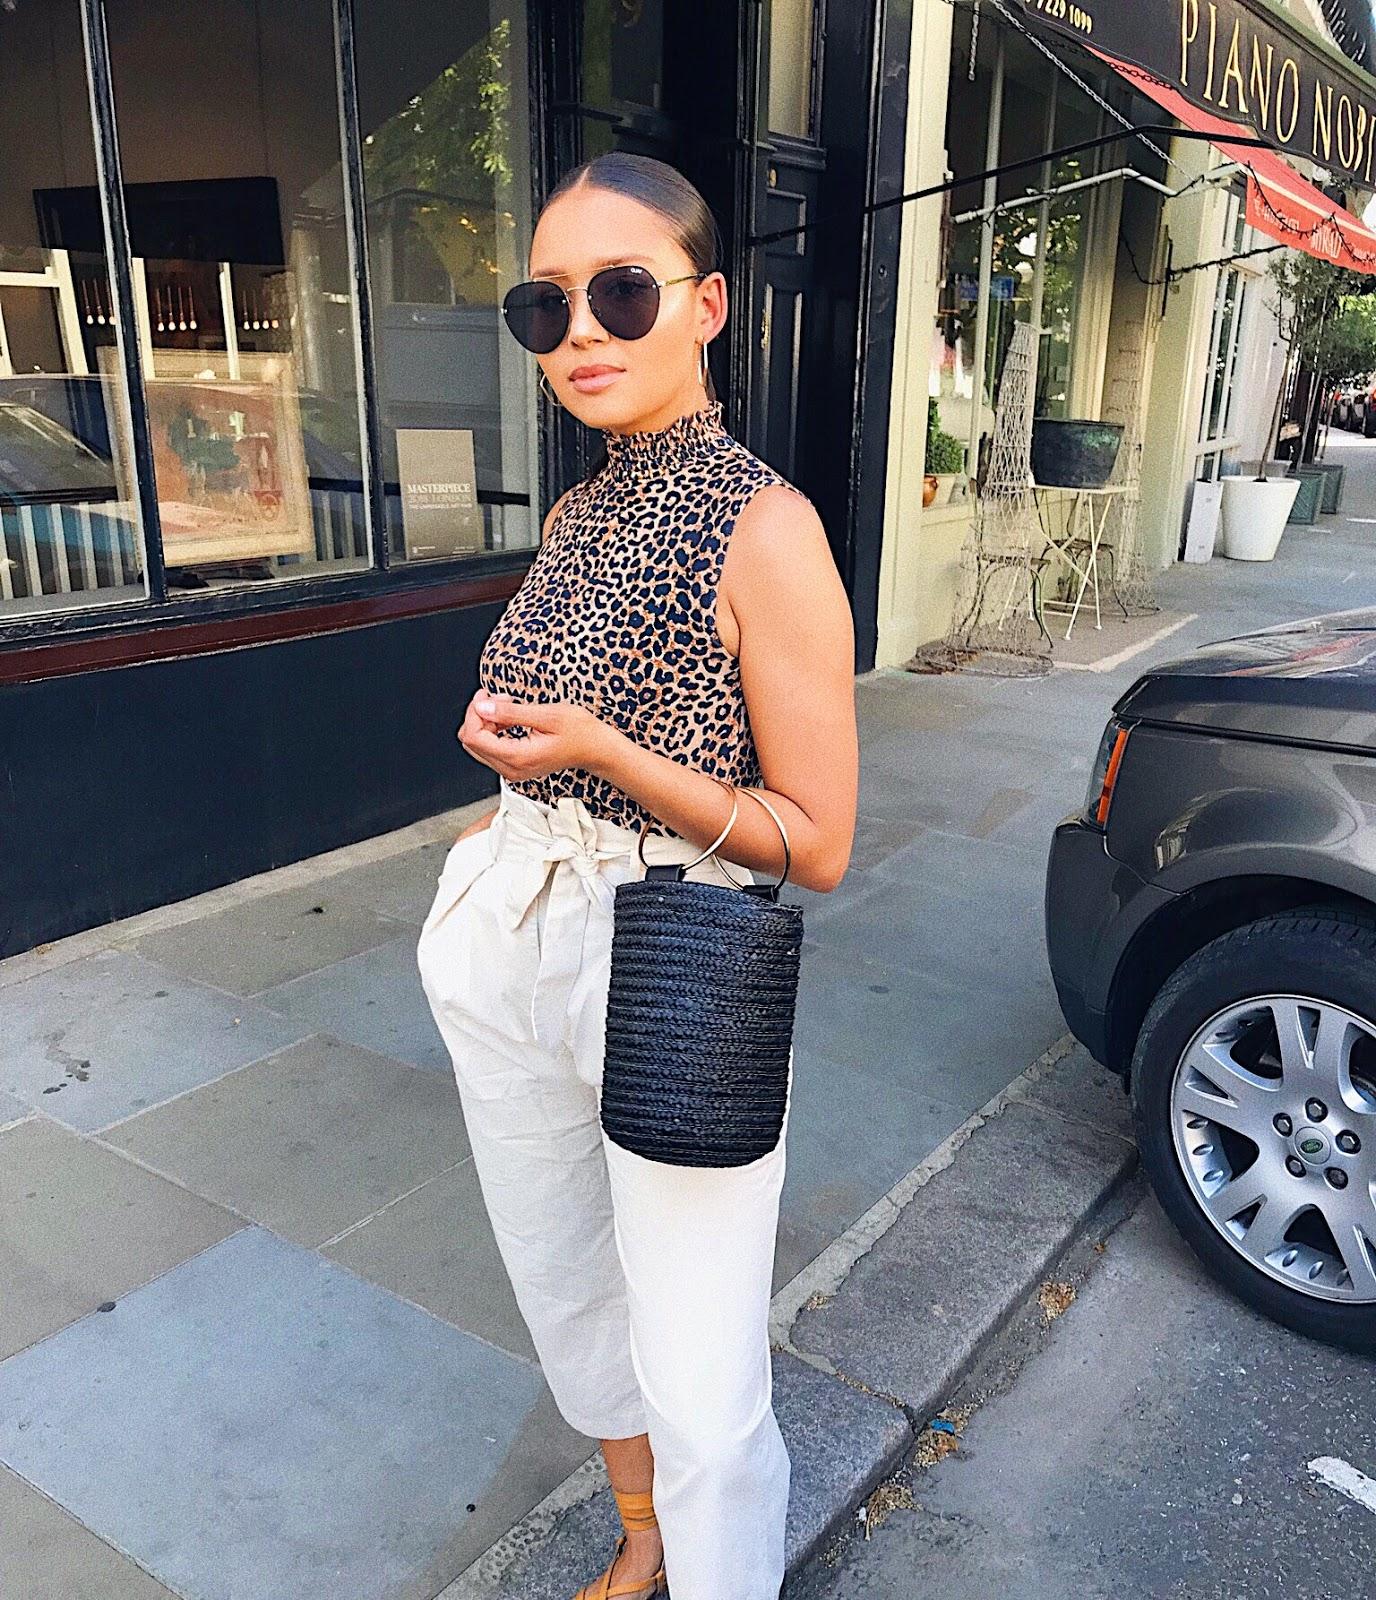 nakd fashion, H&M, quay Australia, fashion Inso, leopard print,